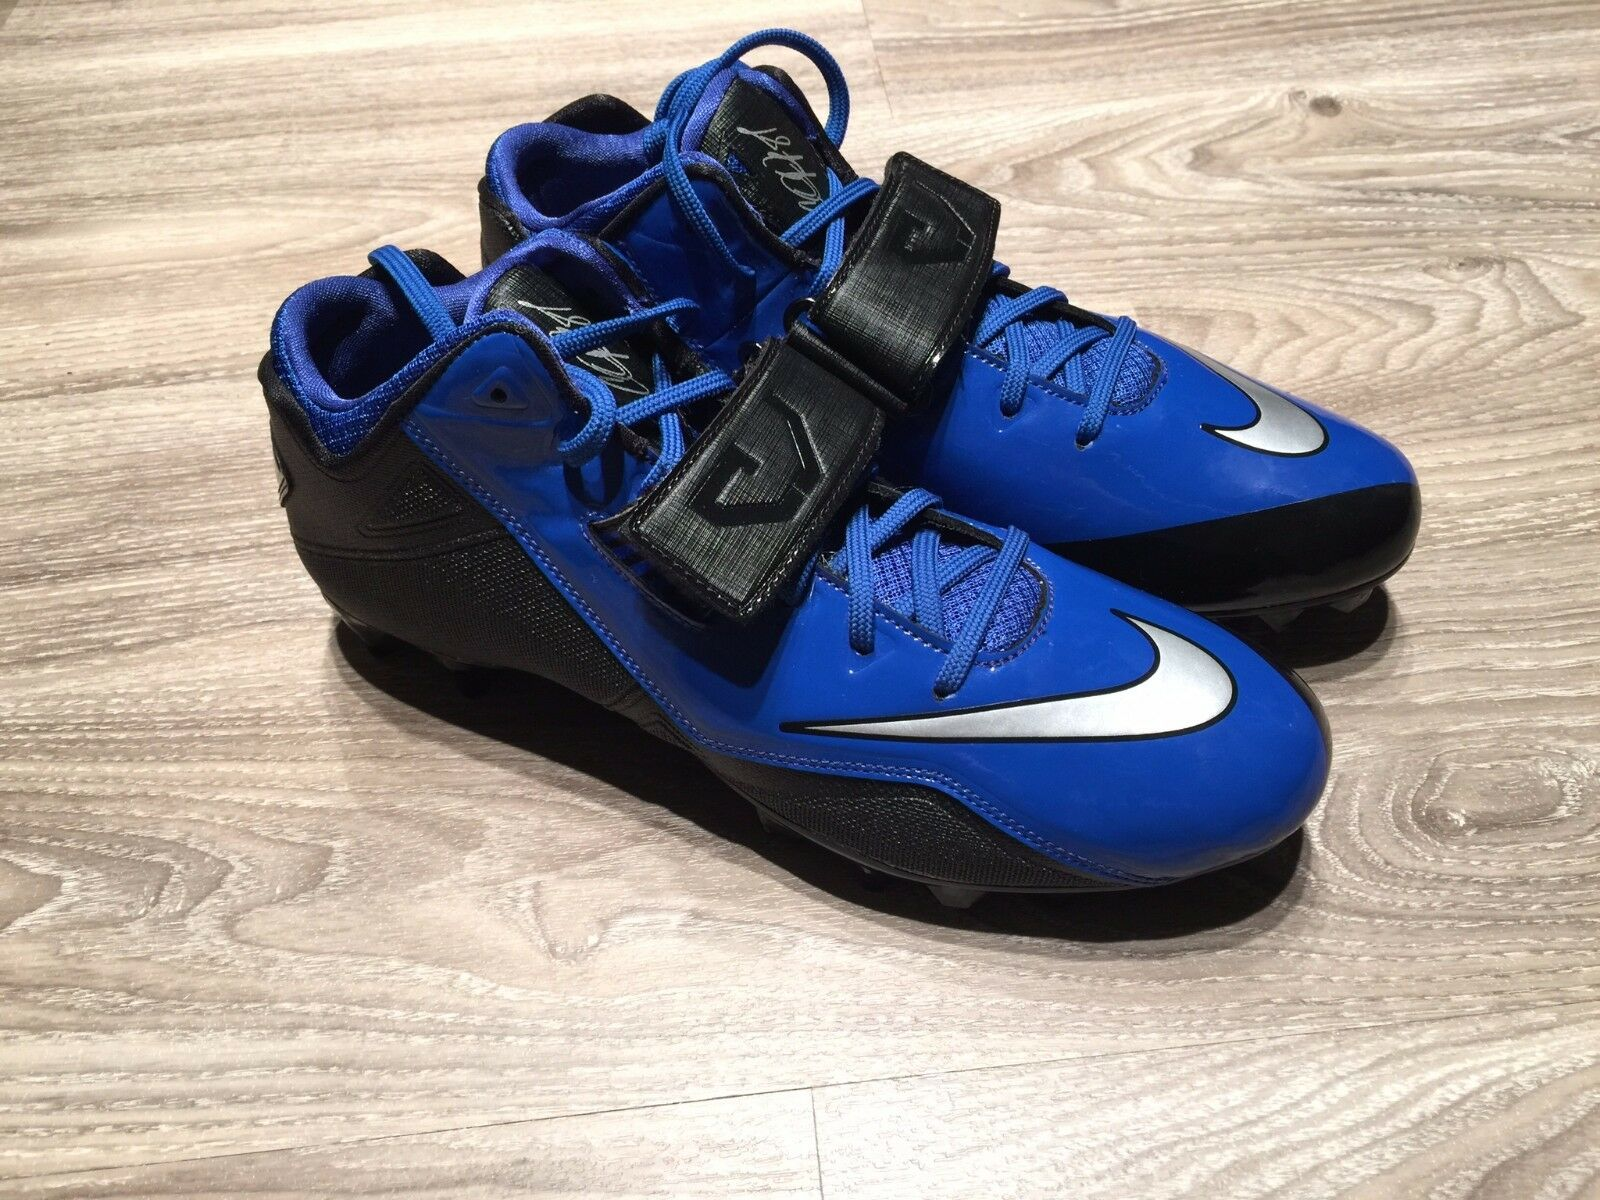 nike cj megatron strike 2 td metà blu blu blu e nero 678119-004 calcio calcio 11,5 | Qualità Primacy  | Gentiluomo/Signora Scarpa  df9abd